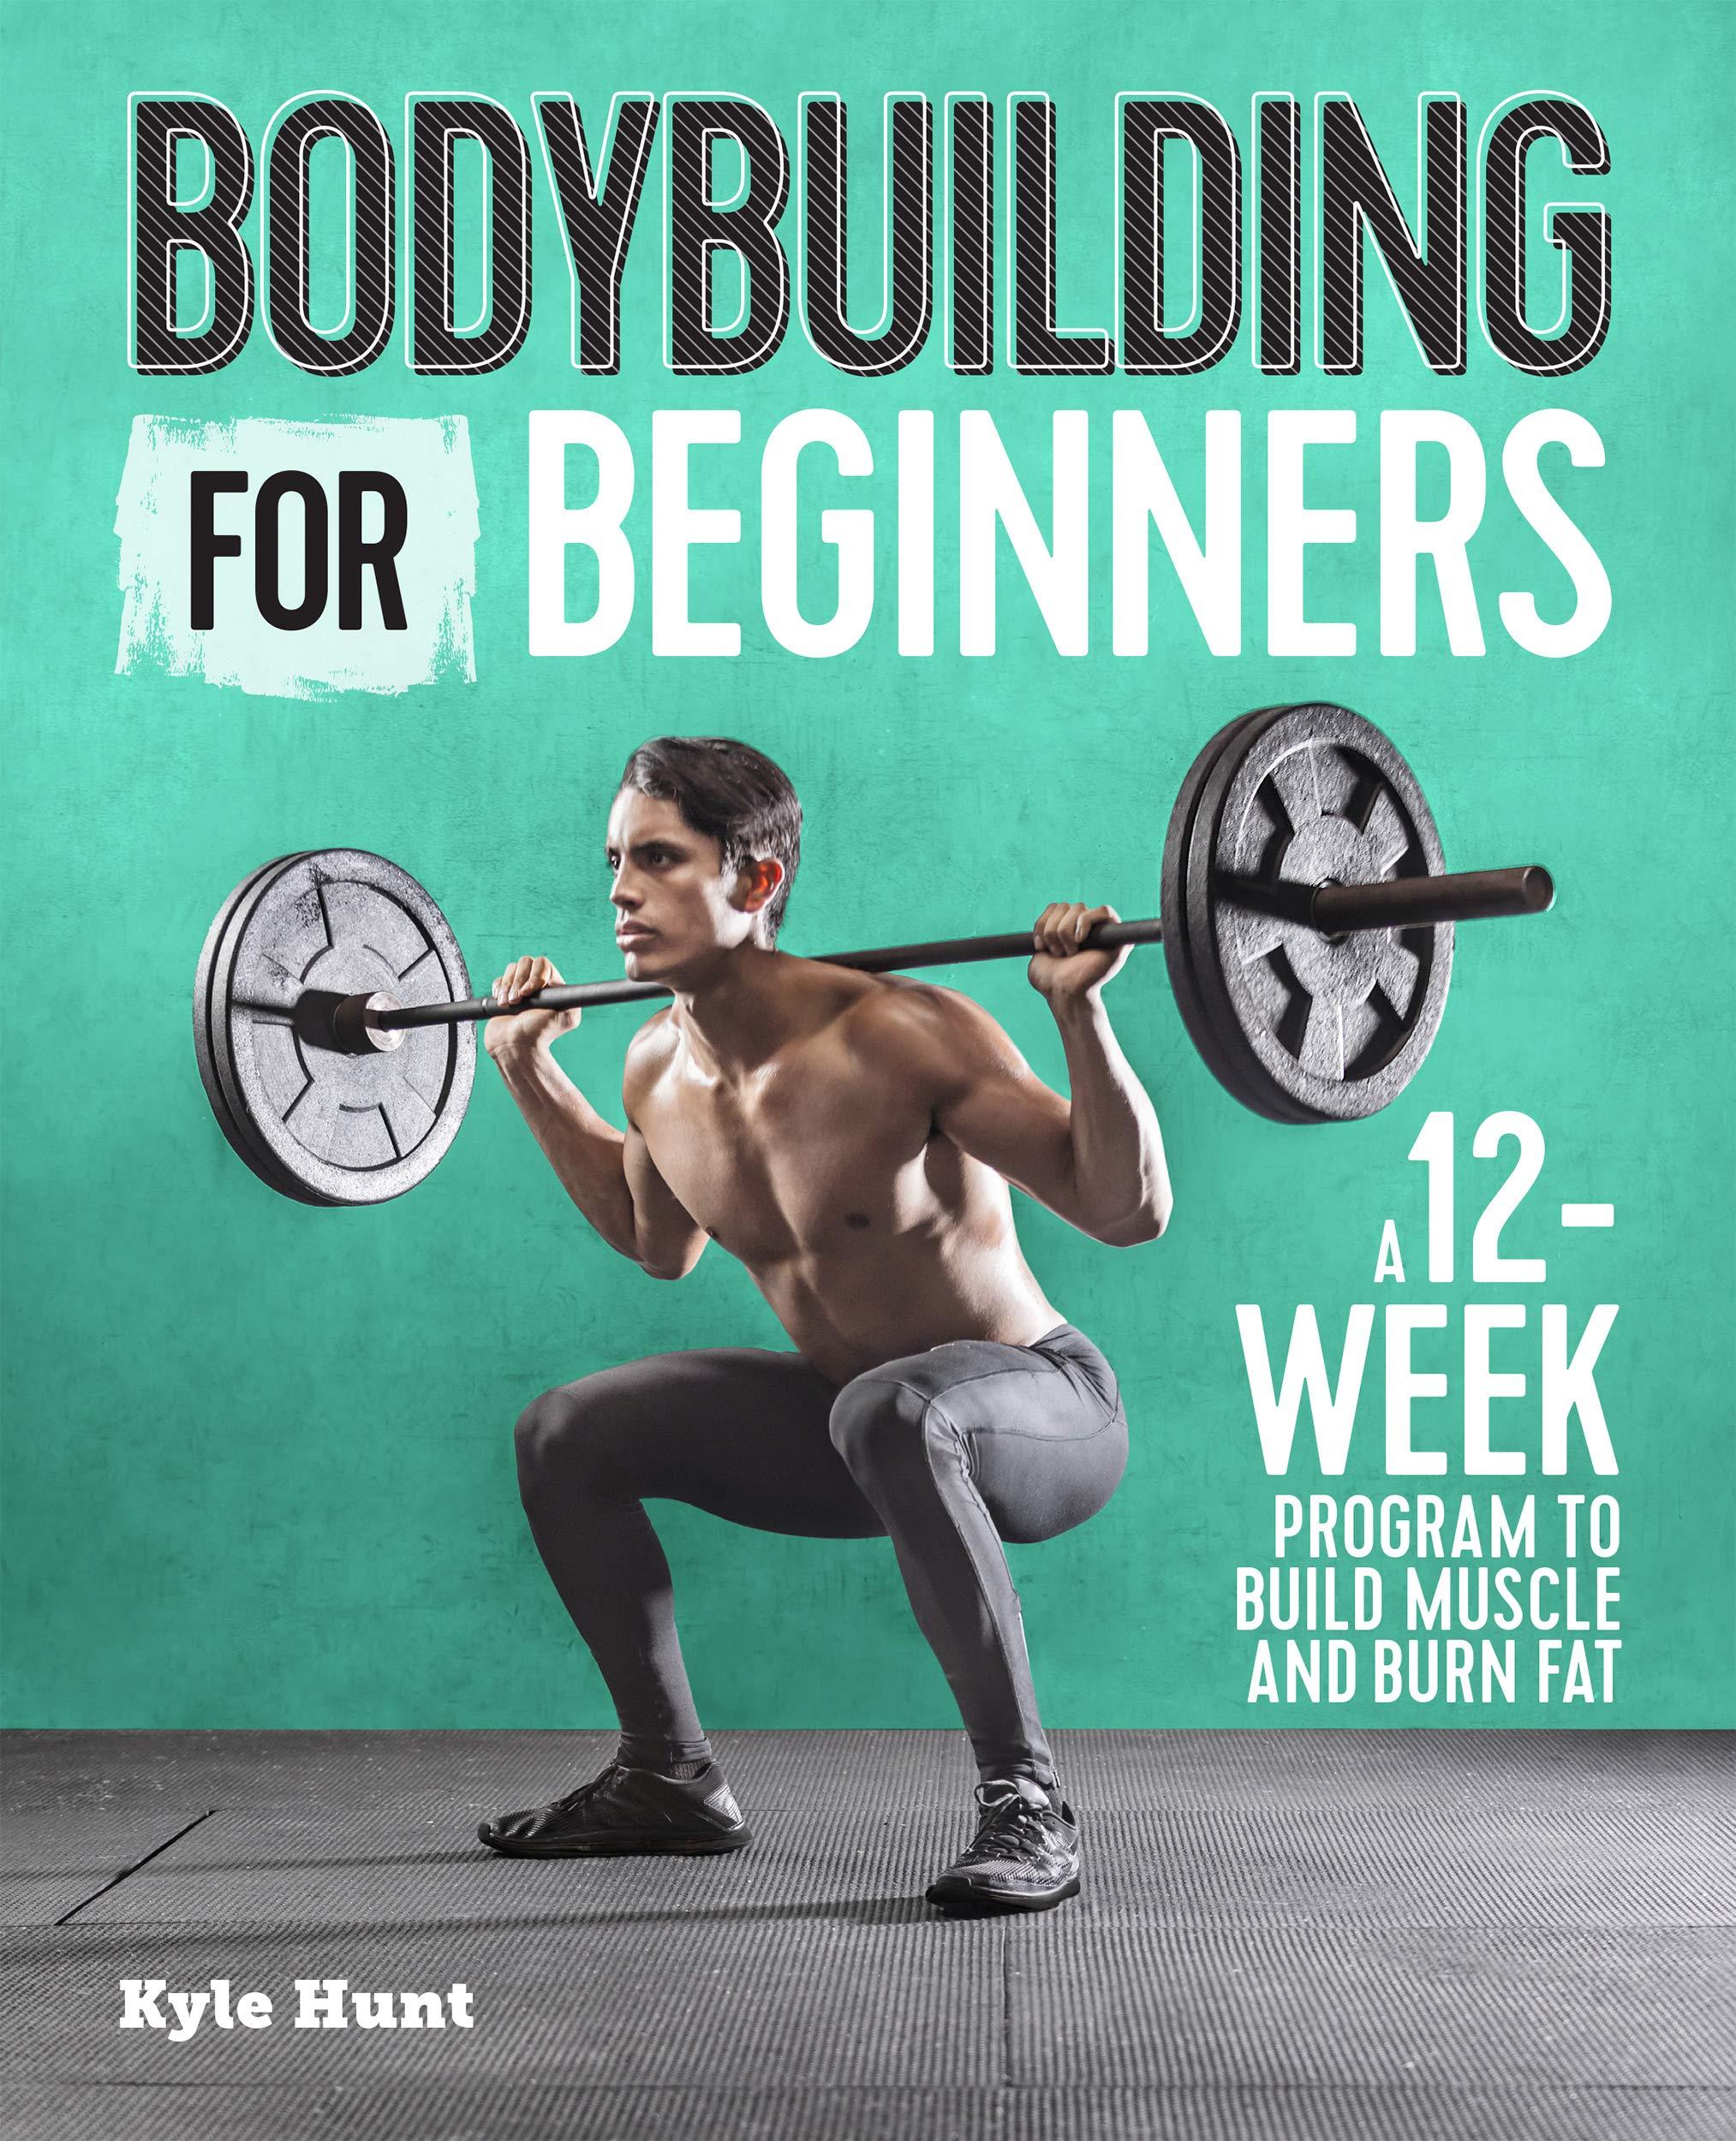 Bodybuilding Beginners 12 Week Program Muscle product image